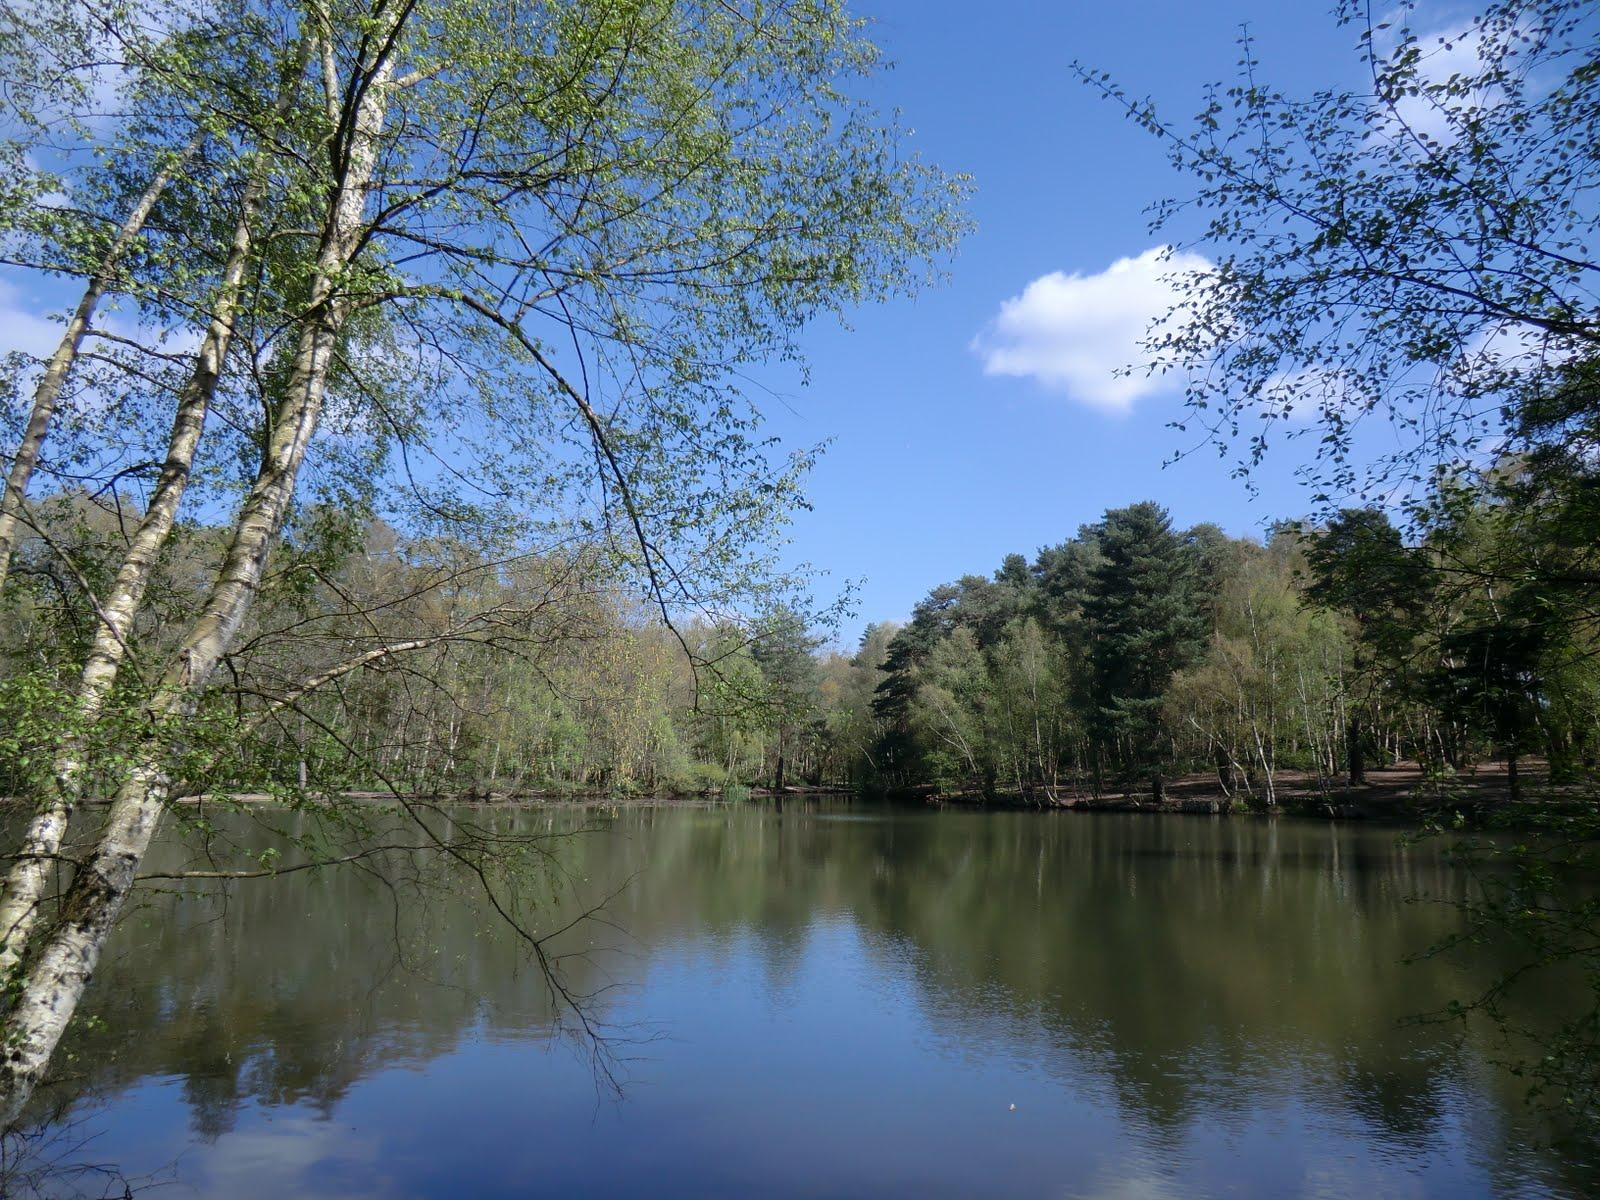 CIMG0446 Heath Pond in spring